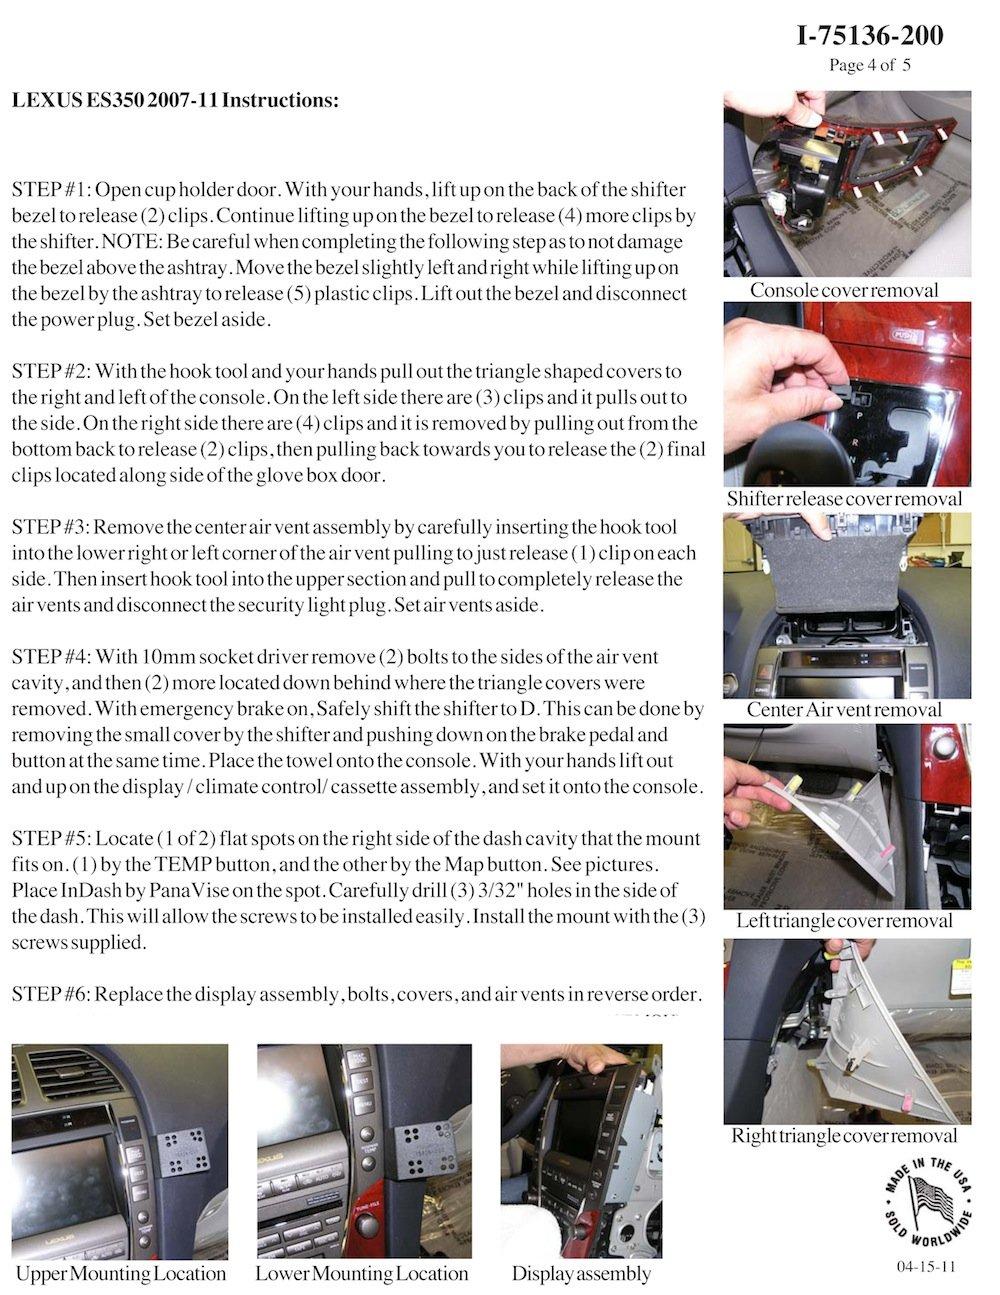 Padholdr Utility Series Premium Locking Tablet Dash Kit for 2002-2011 Lexus ES350 LS460//L and SC430